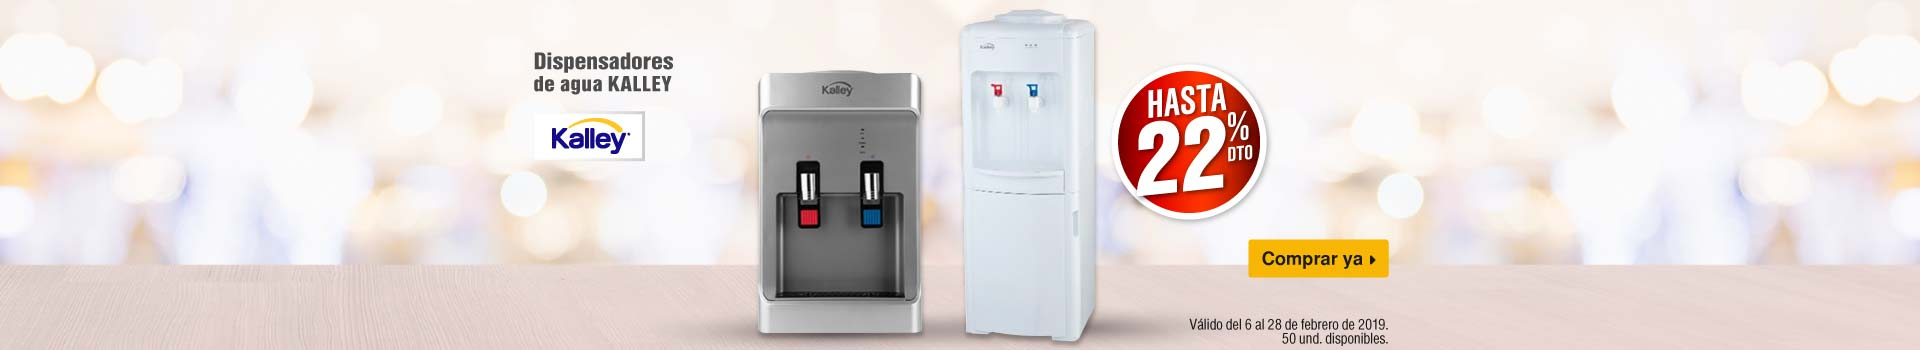 AK-KT-mayores-5-ELECT-BCAT-refrigeracion-050219